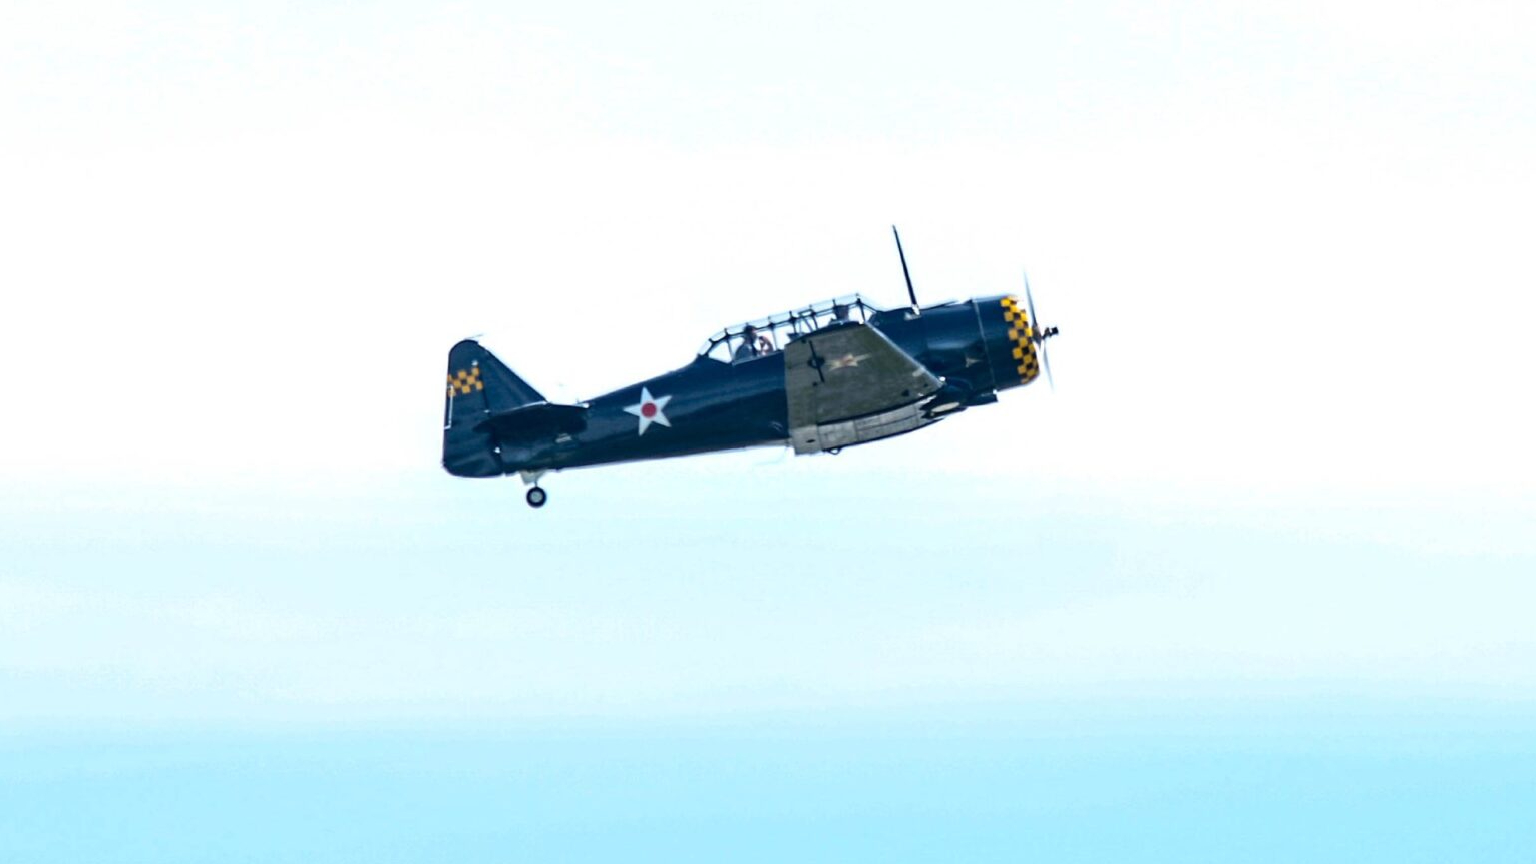 Dark blue airplane with a star